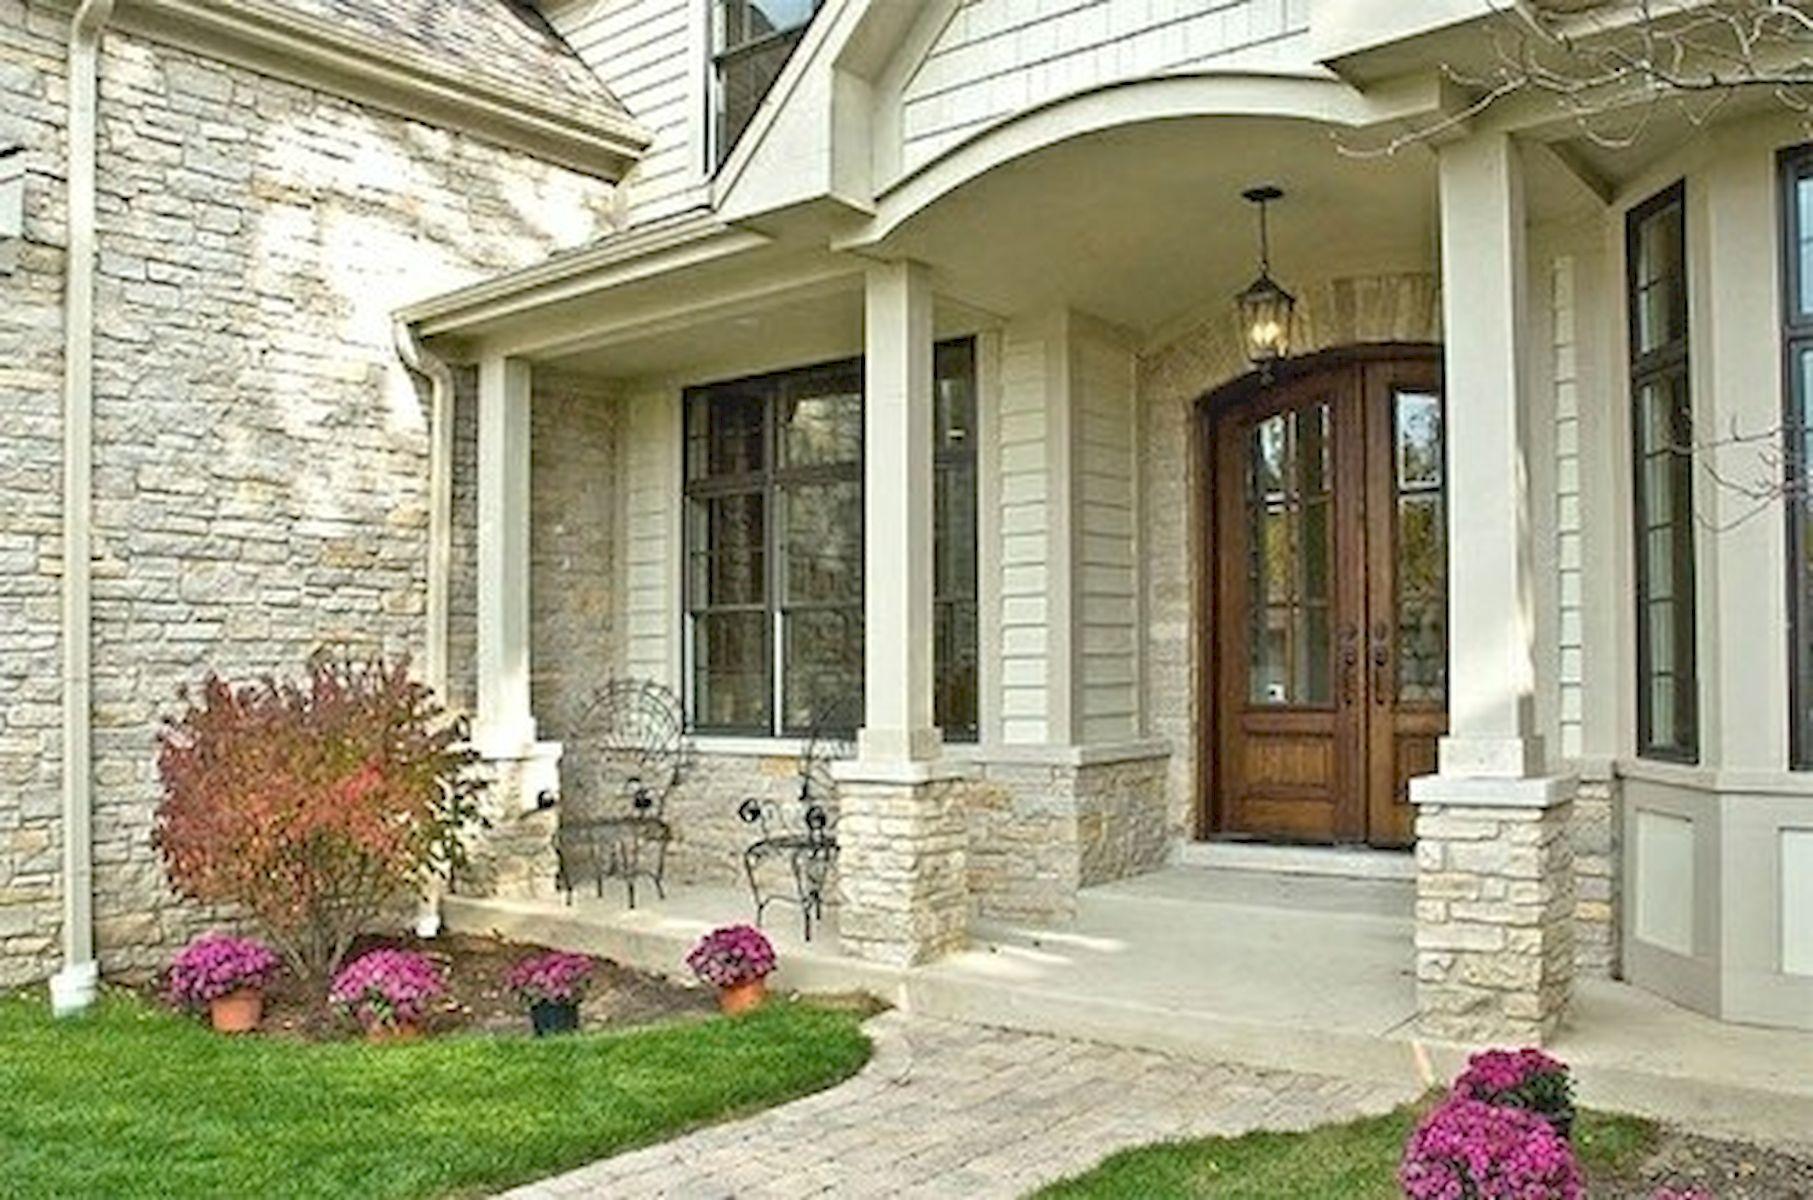 70 Stunning Exterior House Design Ideas (32)